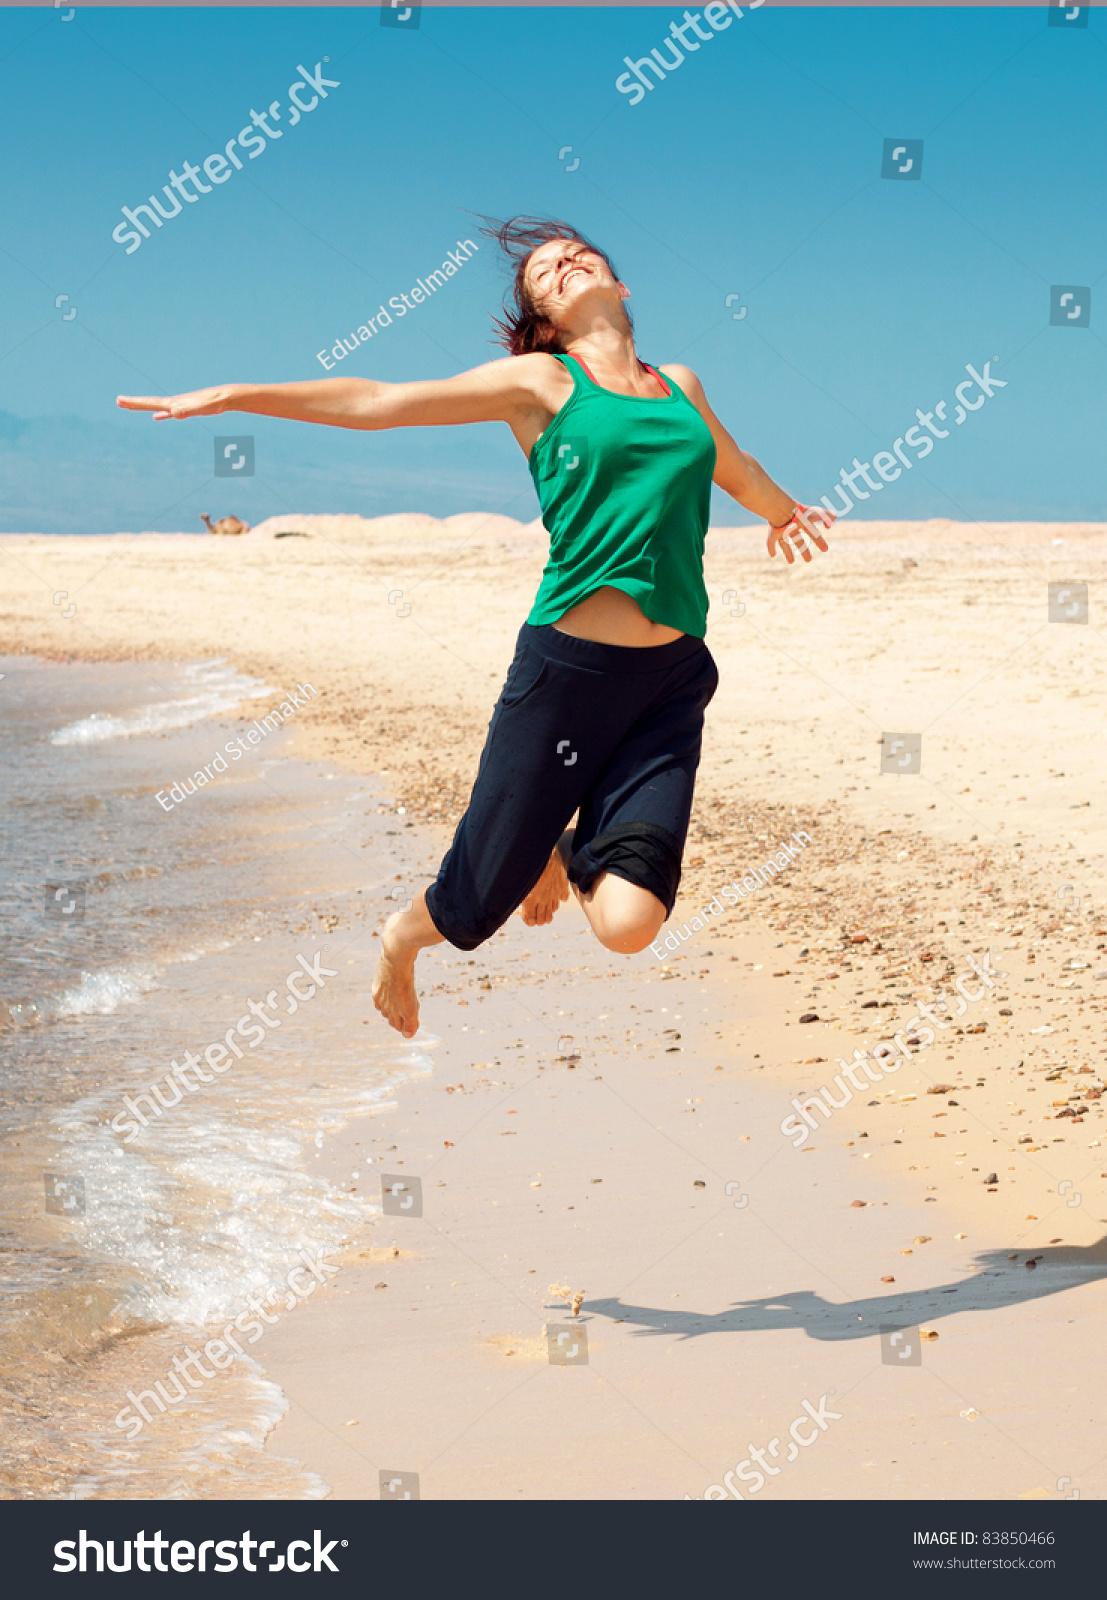 Girl Running On Beach Stock Photo 83850466 : Shutterstock Girl Running On Beach